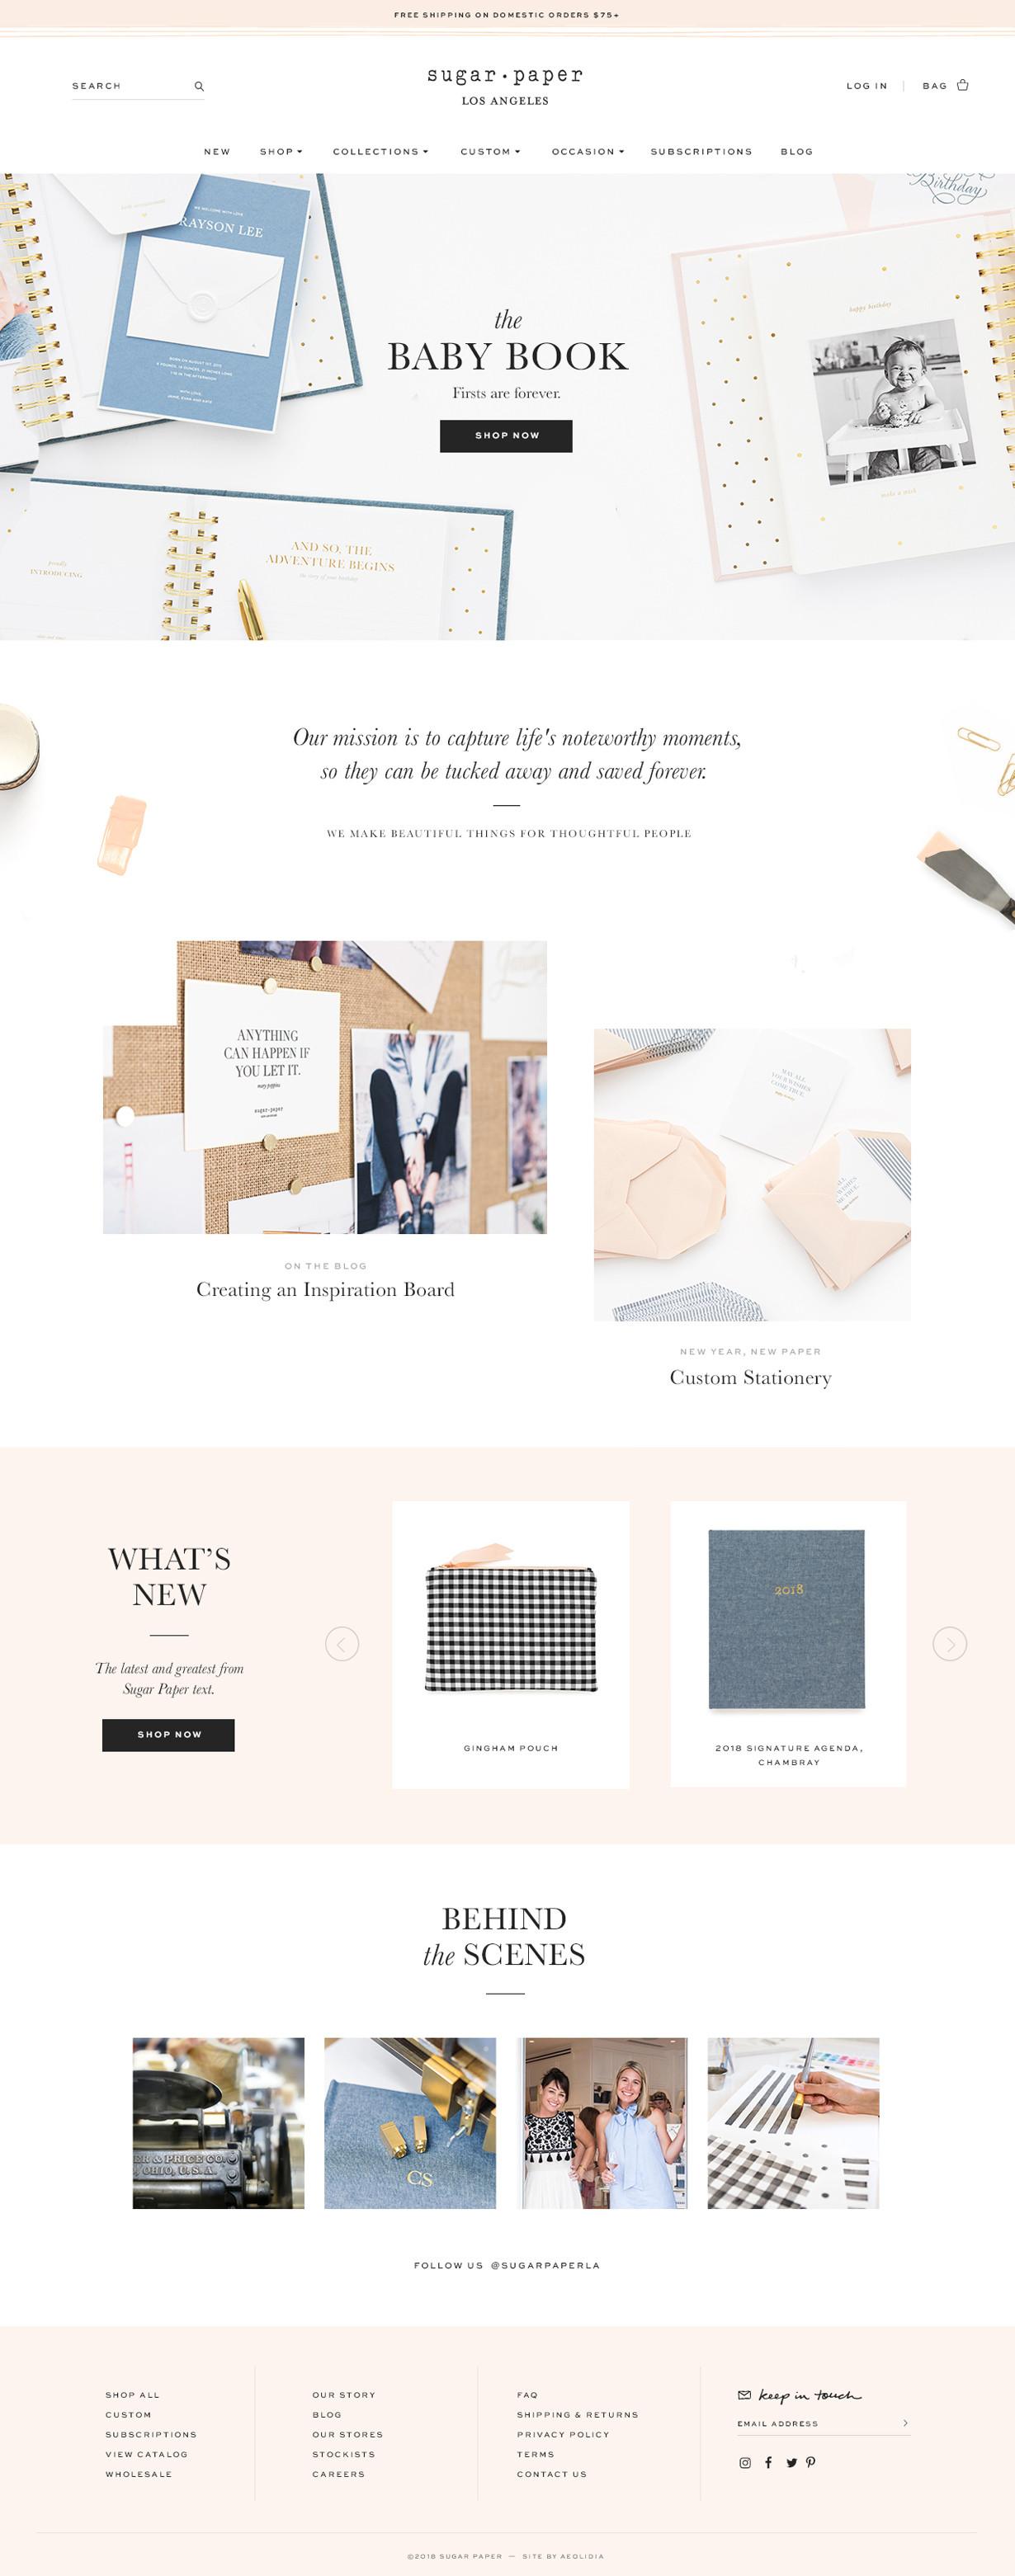 sugarpaper-desktop-home-615x1562@2x.jpg